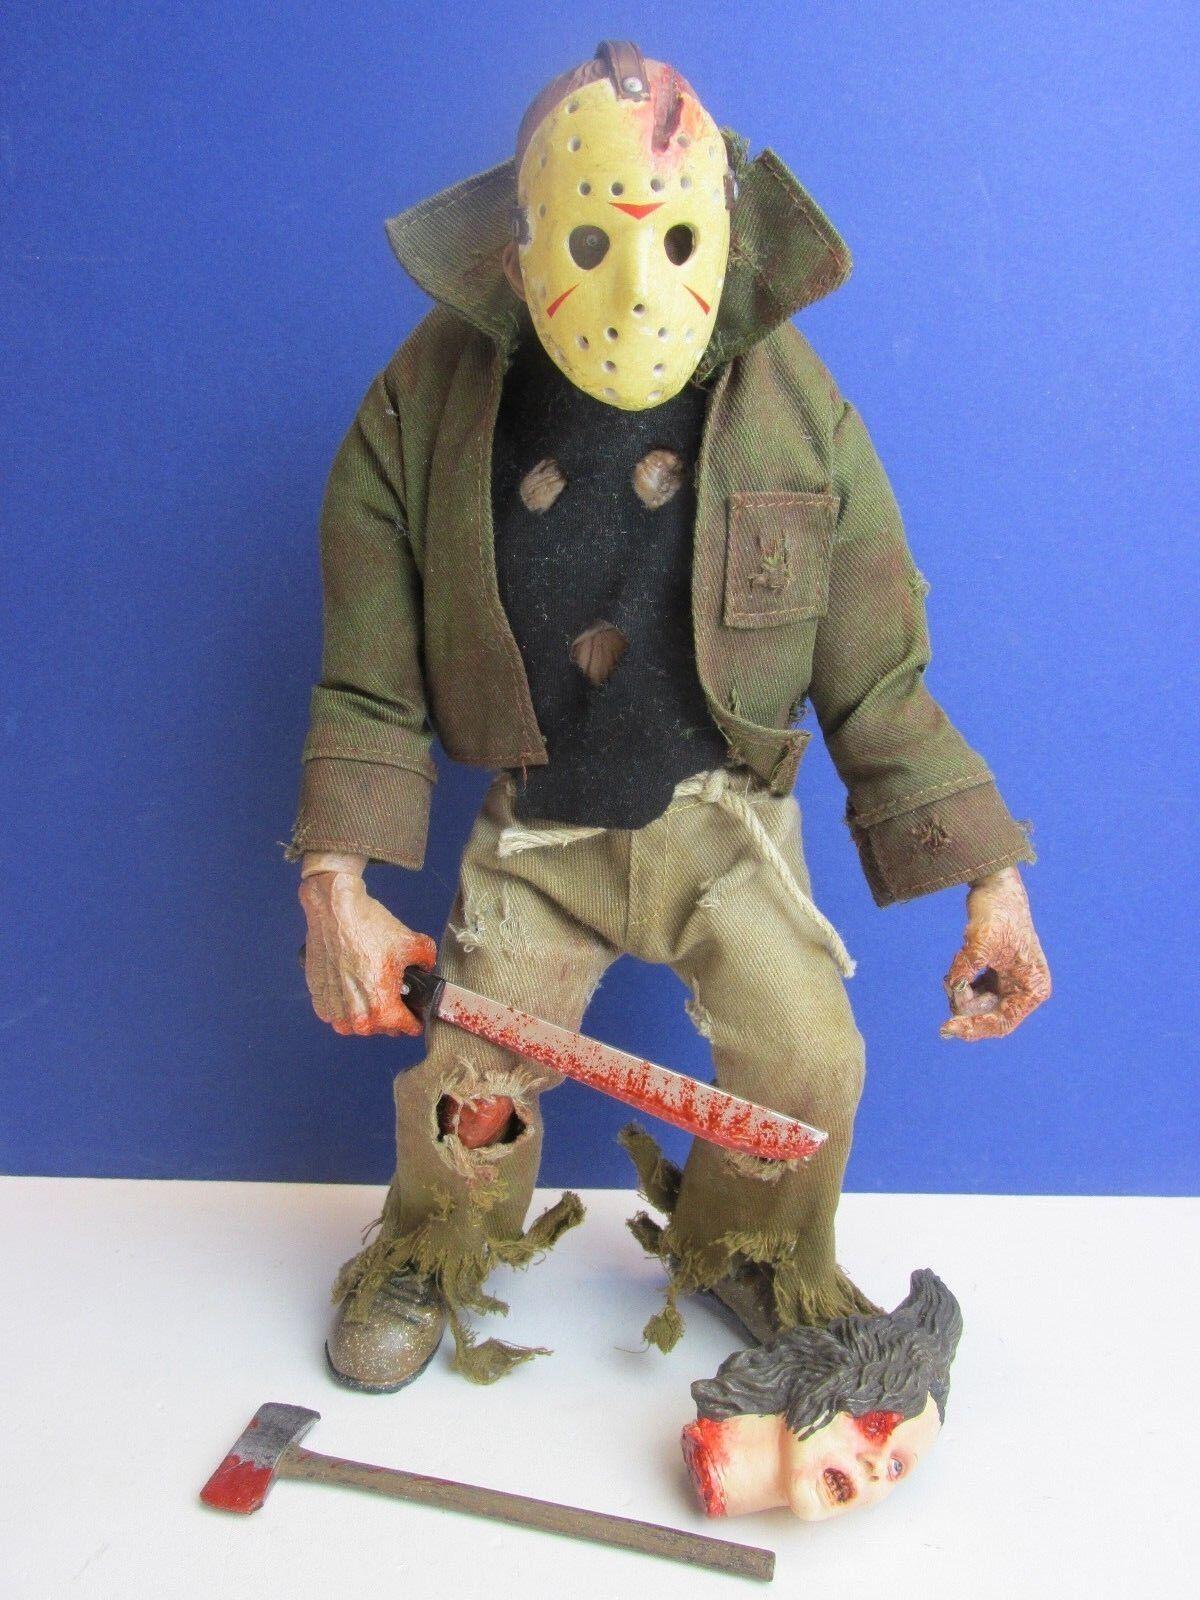 Friday The 13th Jason Voorhees 10 Action Figure Mezco Mezco Figure